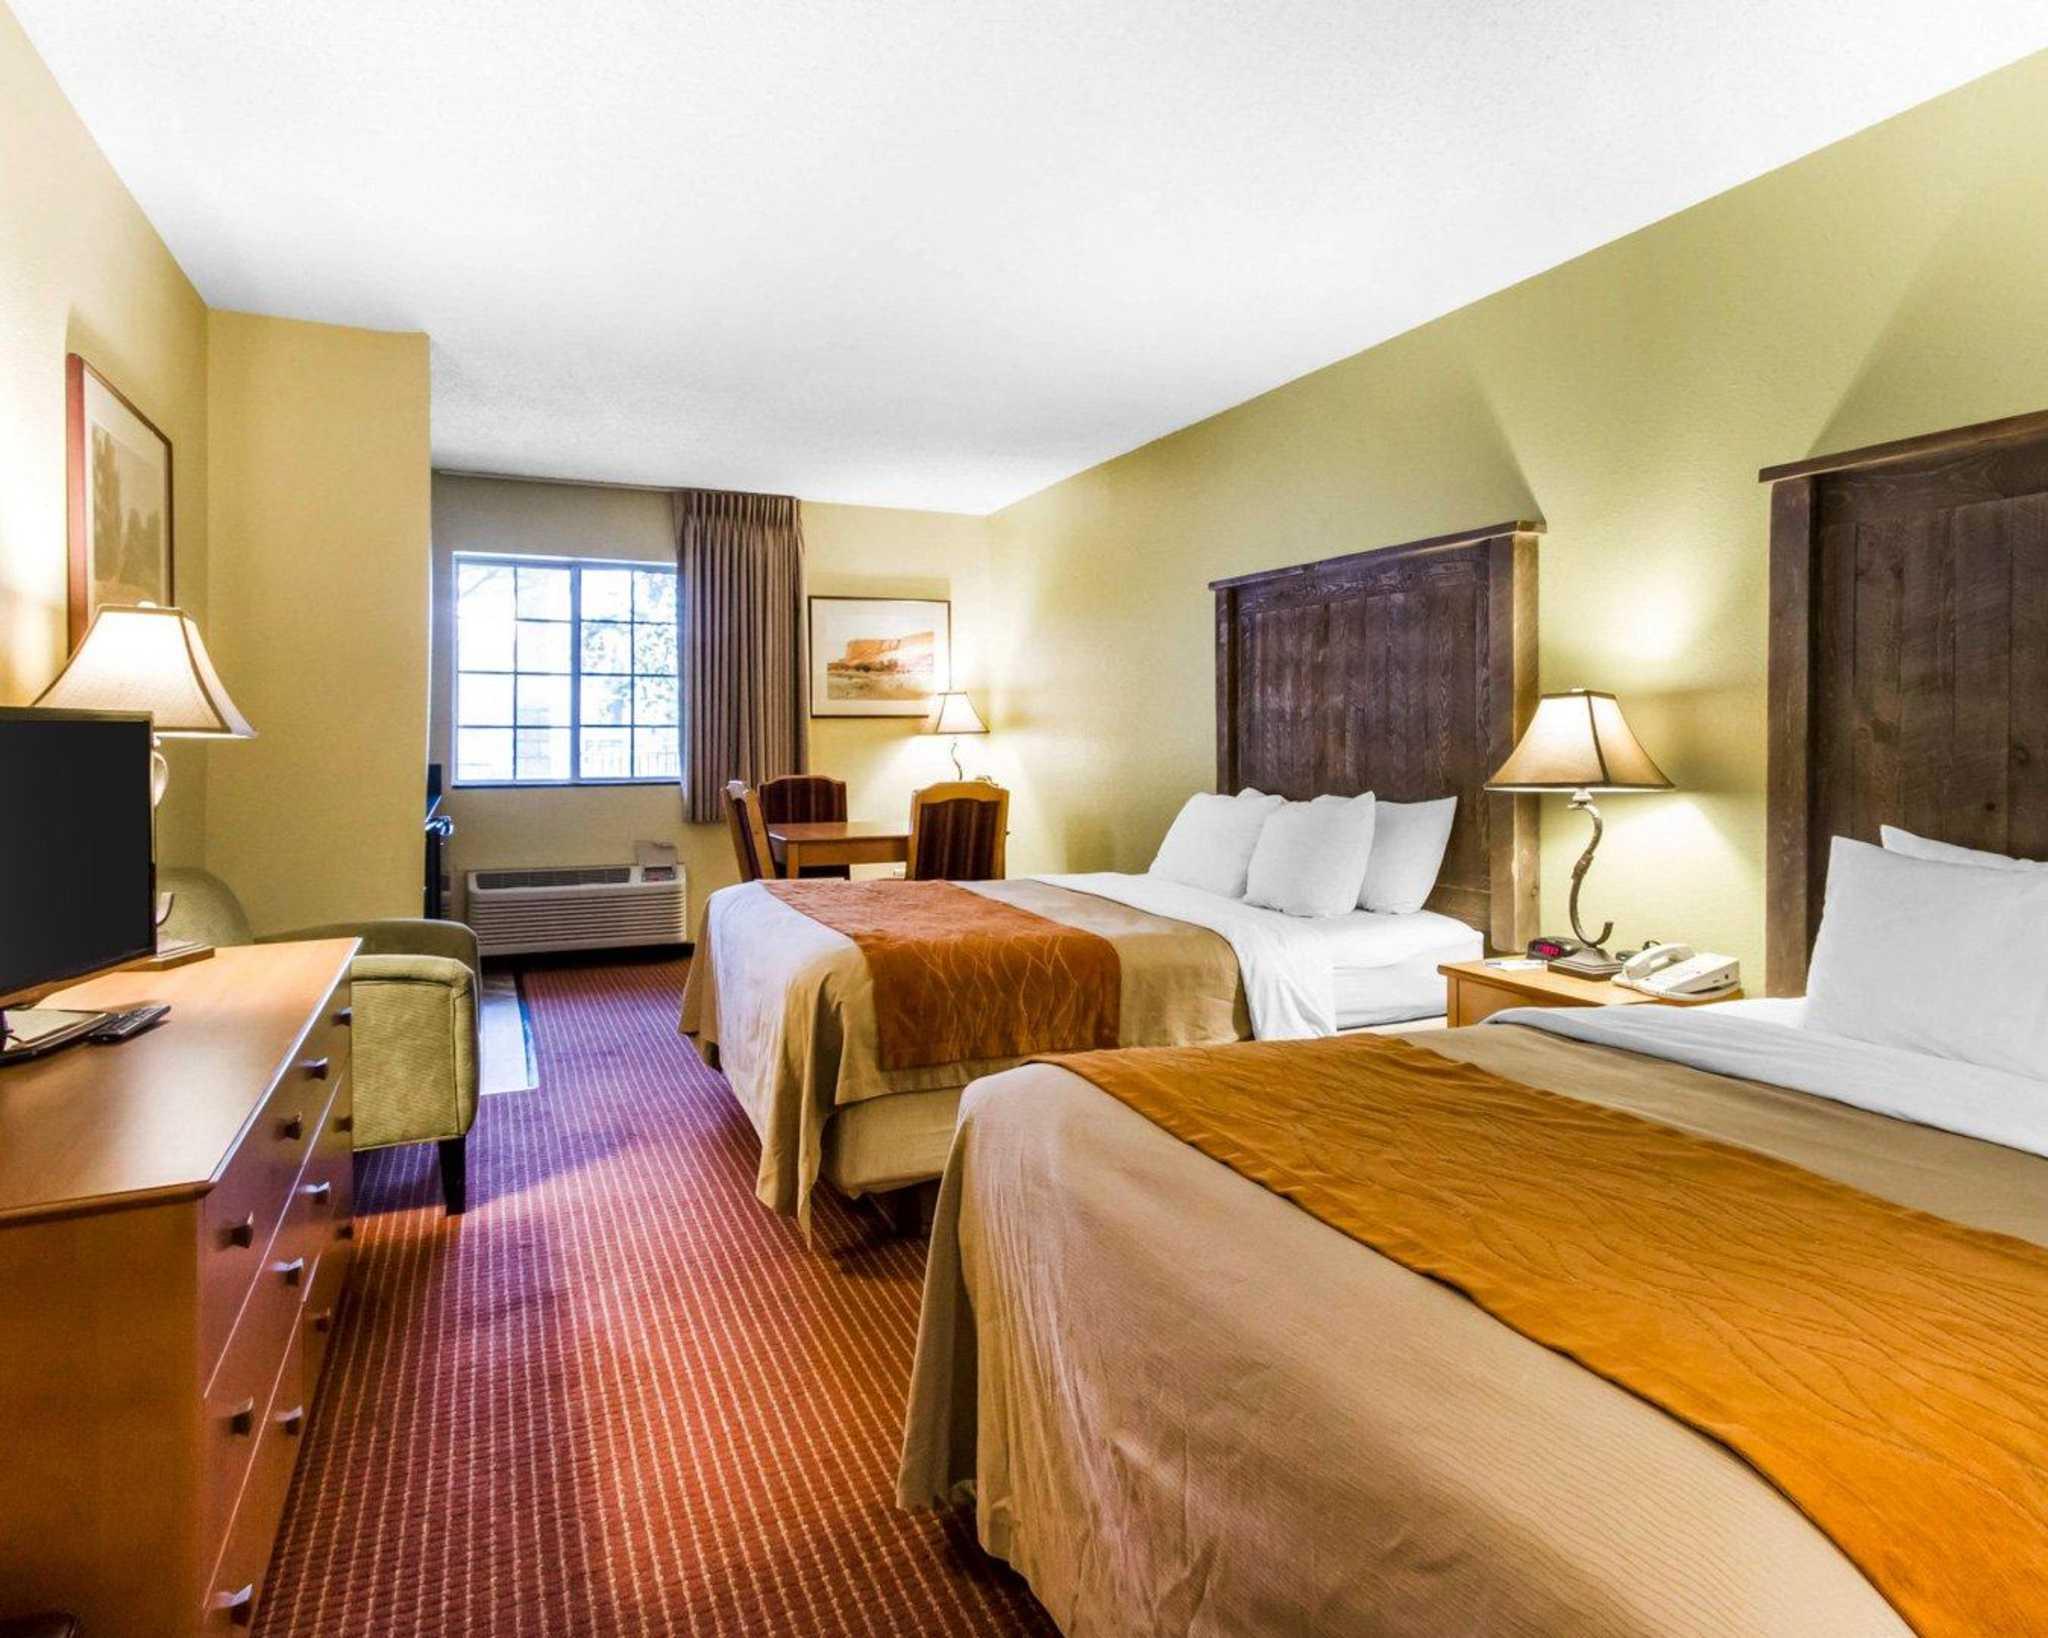 Comfort Inn I-17 & I-40 image 24